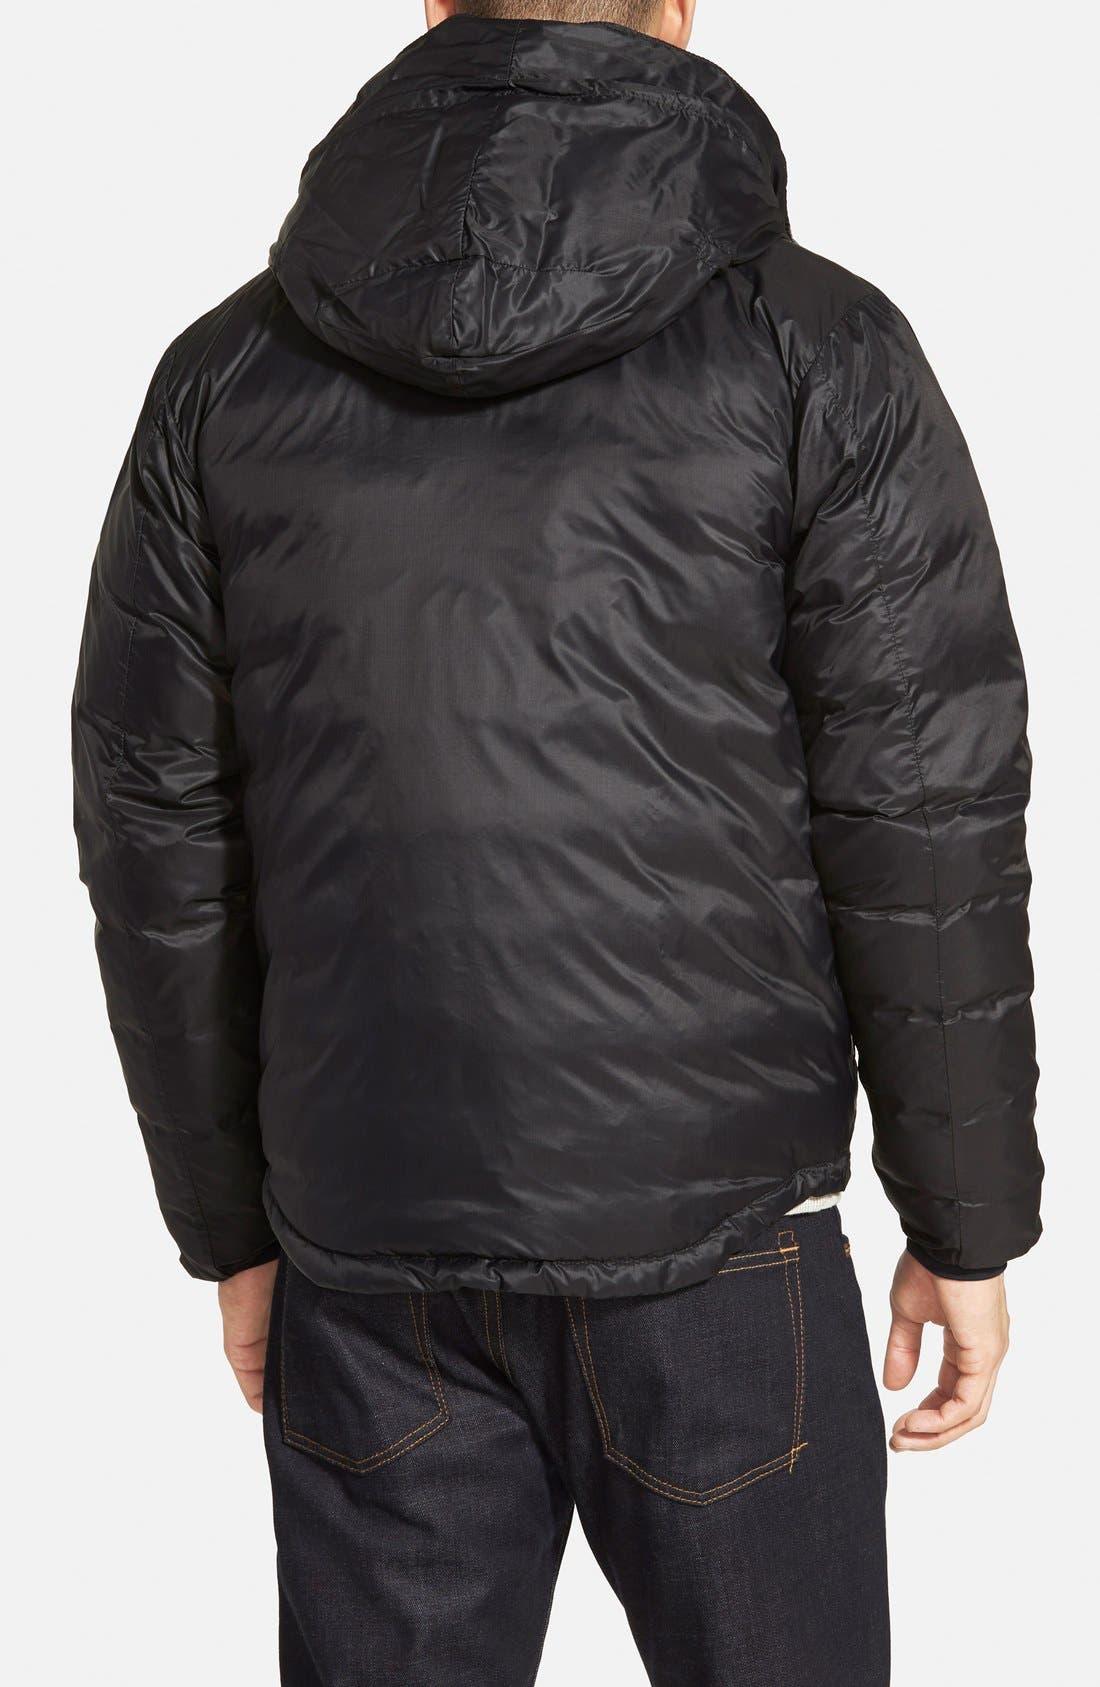 'Lodge' Slim Fit Packable Jacket,                             Alternate thumbnail 9, color,                             BLACK